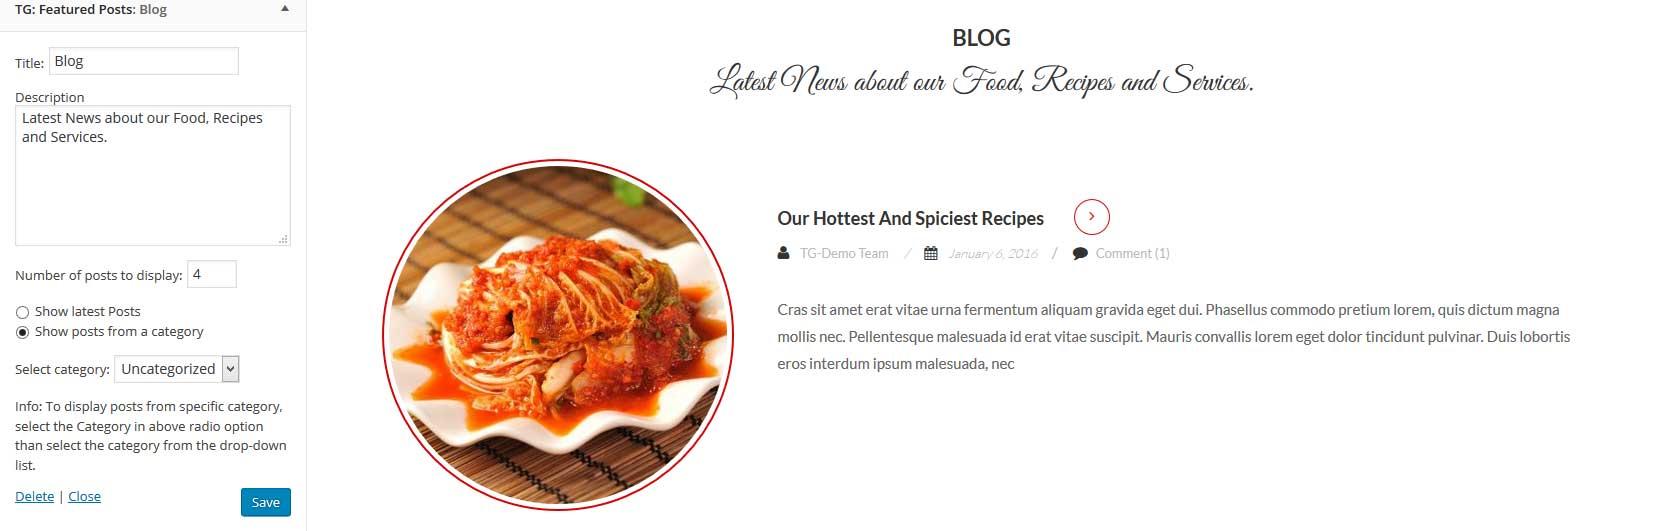 foodhunt-blogs